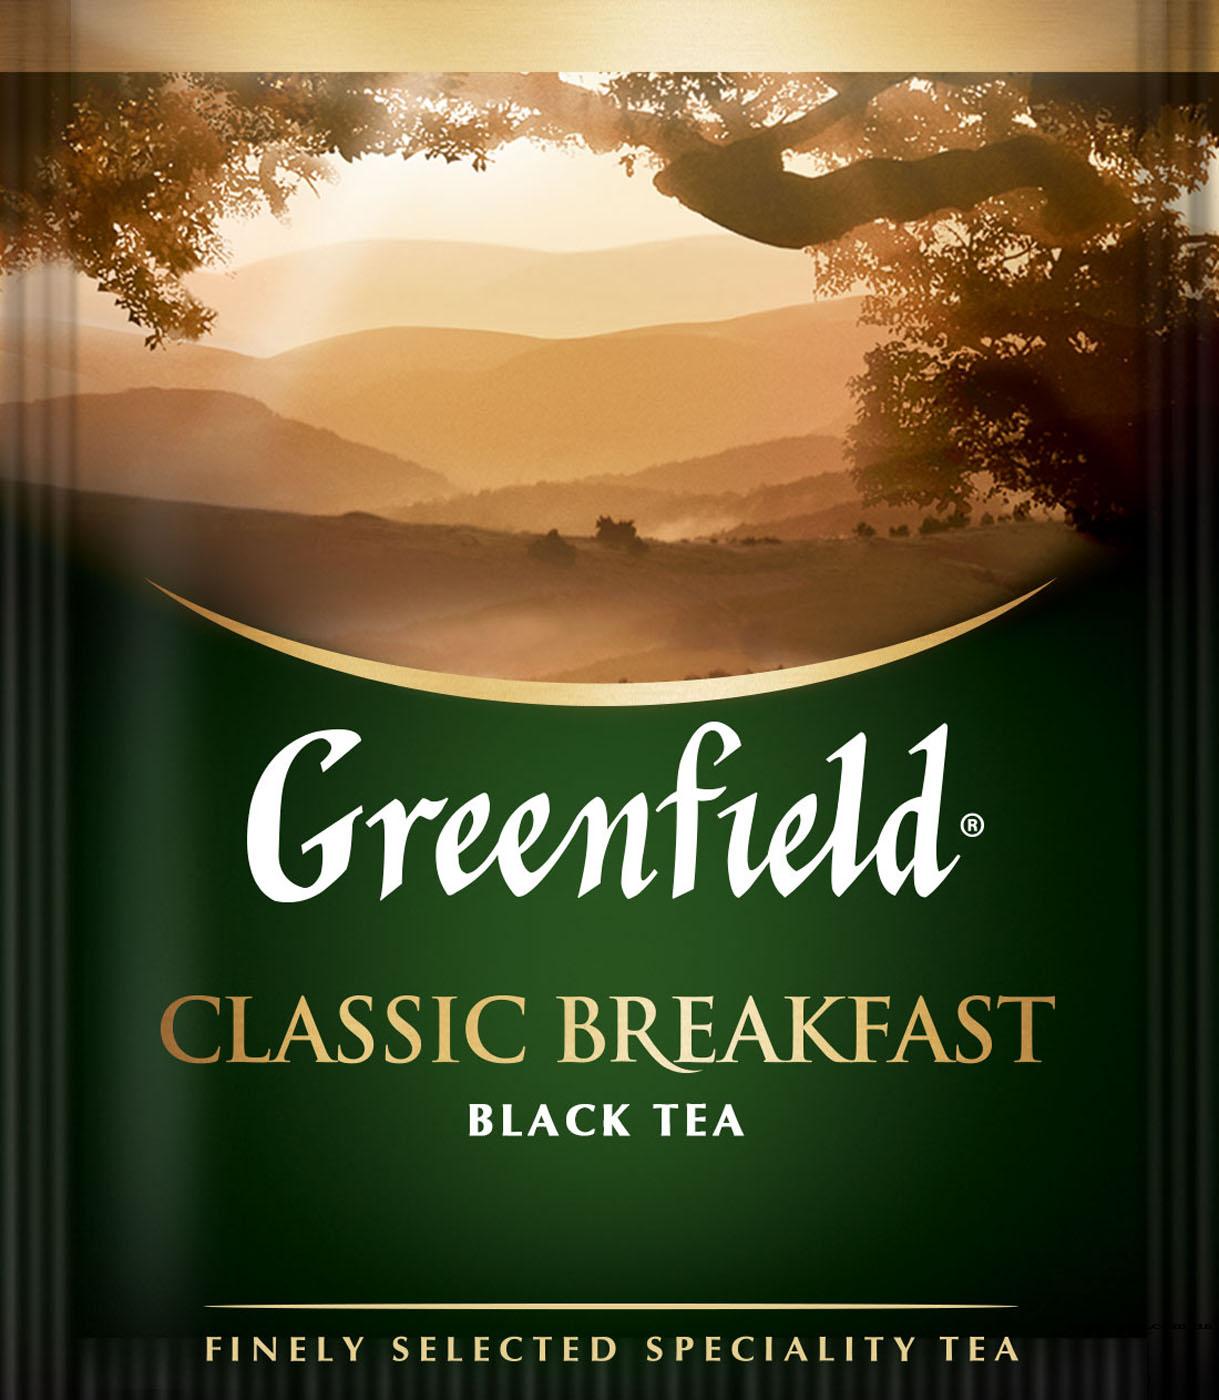 Чай черный классический Classic Breakfast 100пак. по 2гр., термосаше, в пакете Greenfield - фото 1